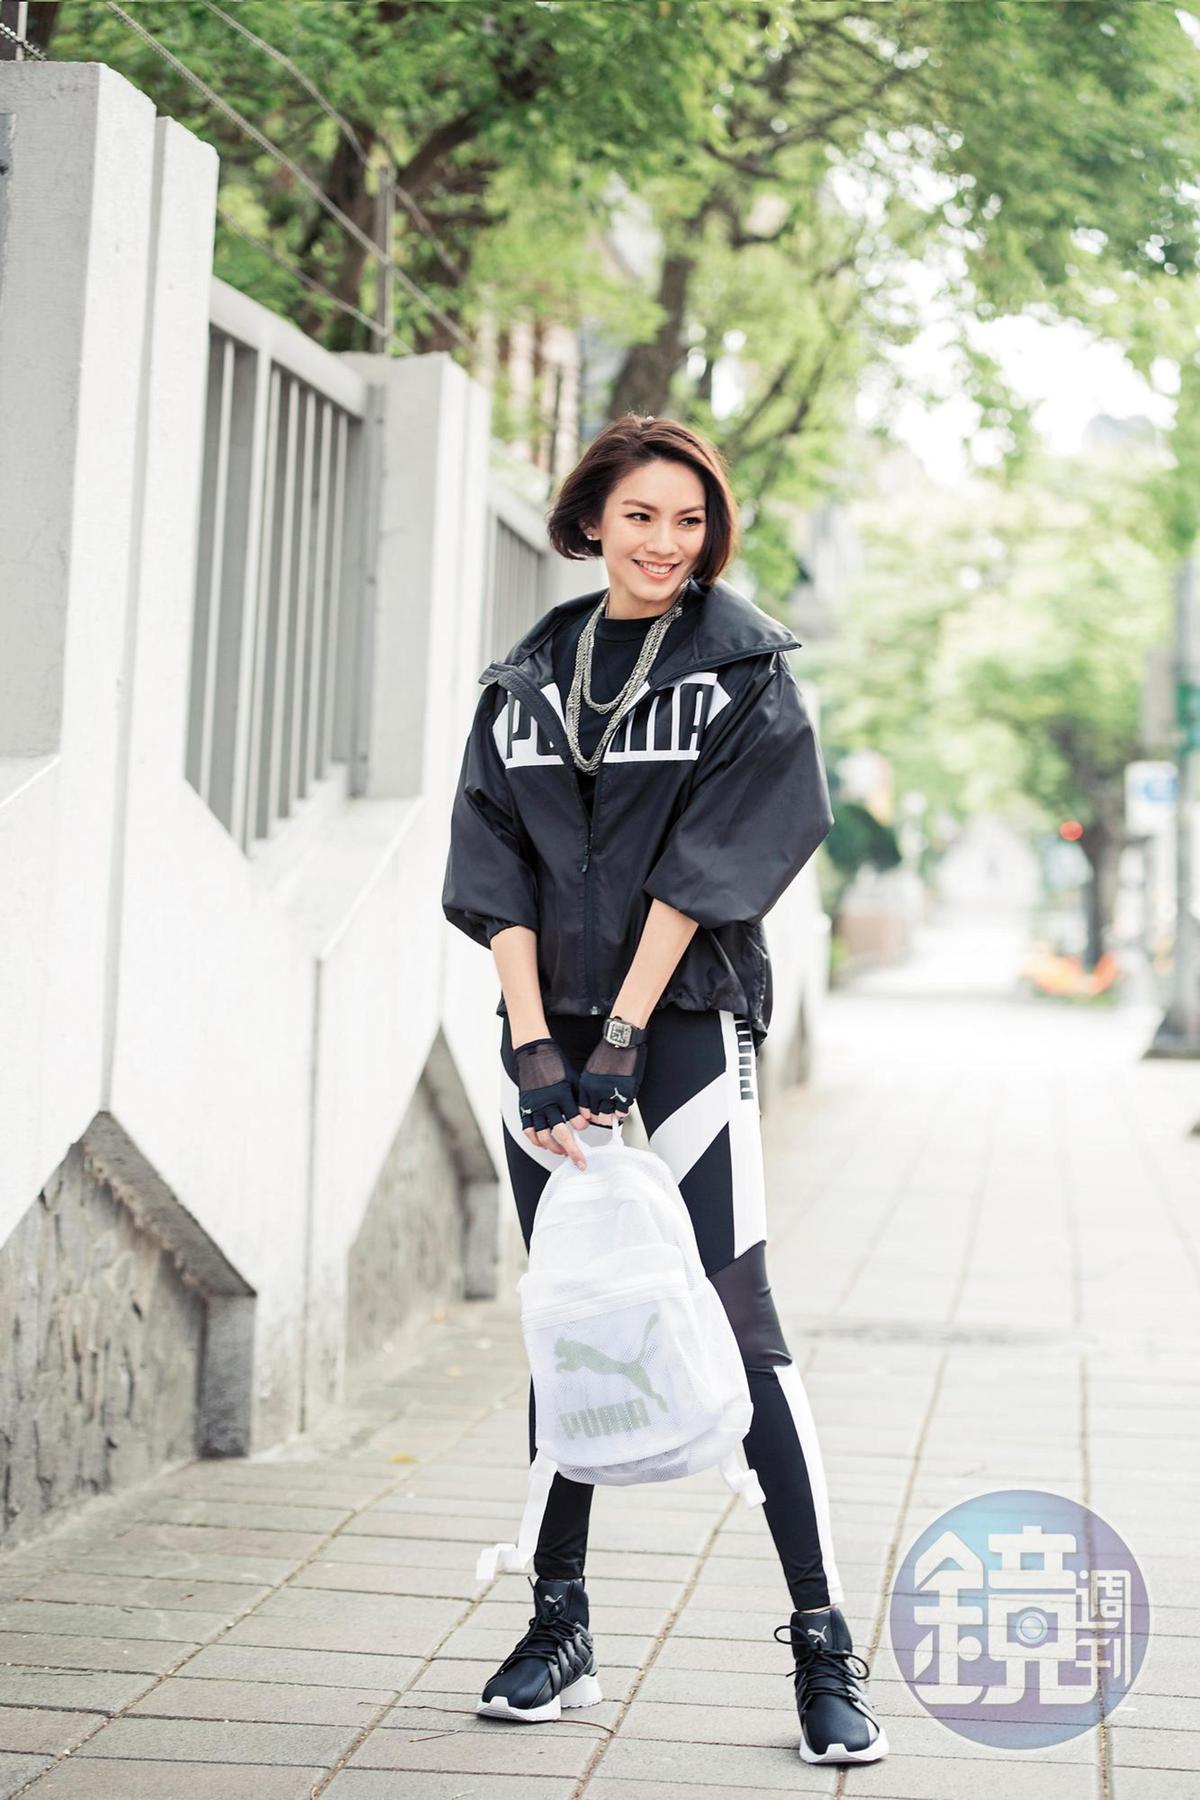 PUMA黑色logo外套。NT$2,480/PUMA黑色上衣。NT$1,280/PUMA黑白運動leggings。NT$1,480/PUMA白色後背包。NT$1,380/PUMA黑色球鞋。NT$3,980。